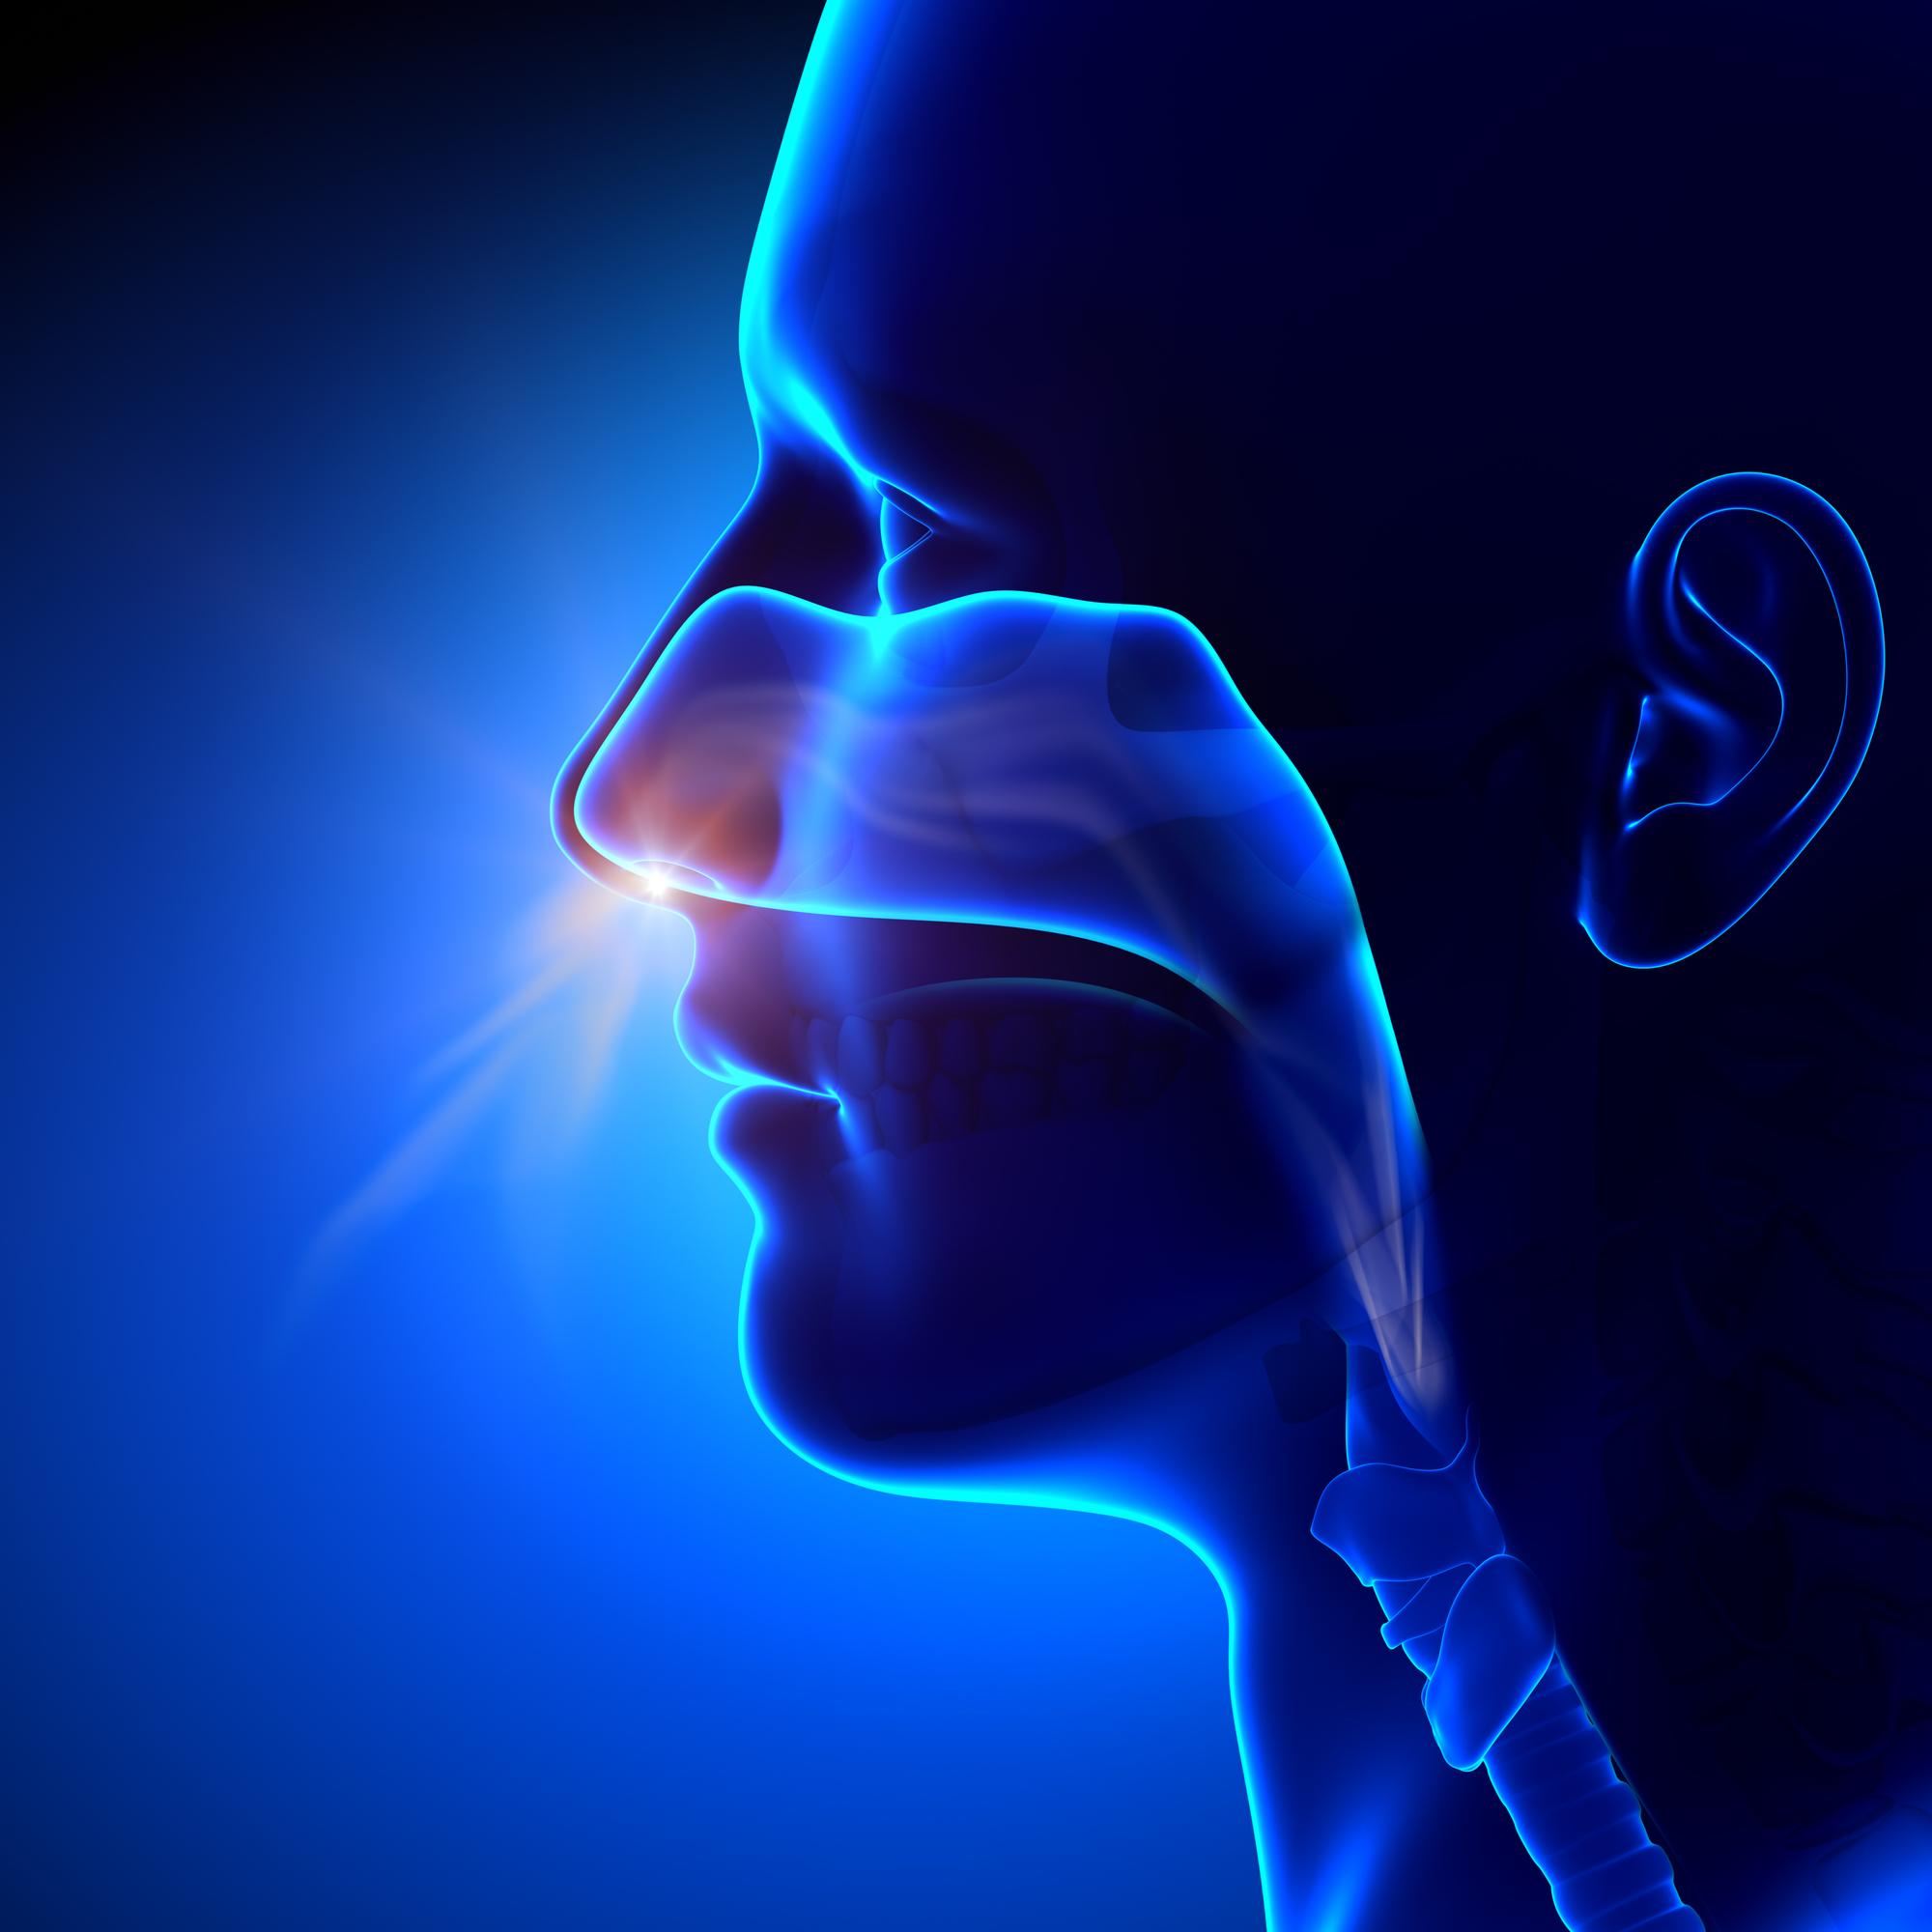 Oxygenoterapia - odhaľte tajomstvo terapia kyslíkom